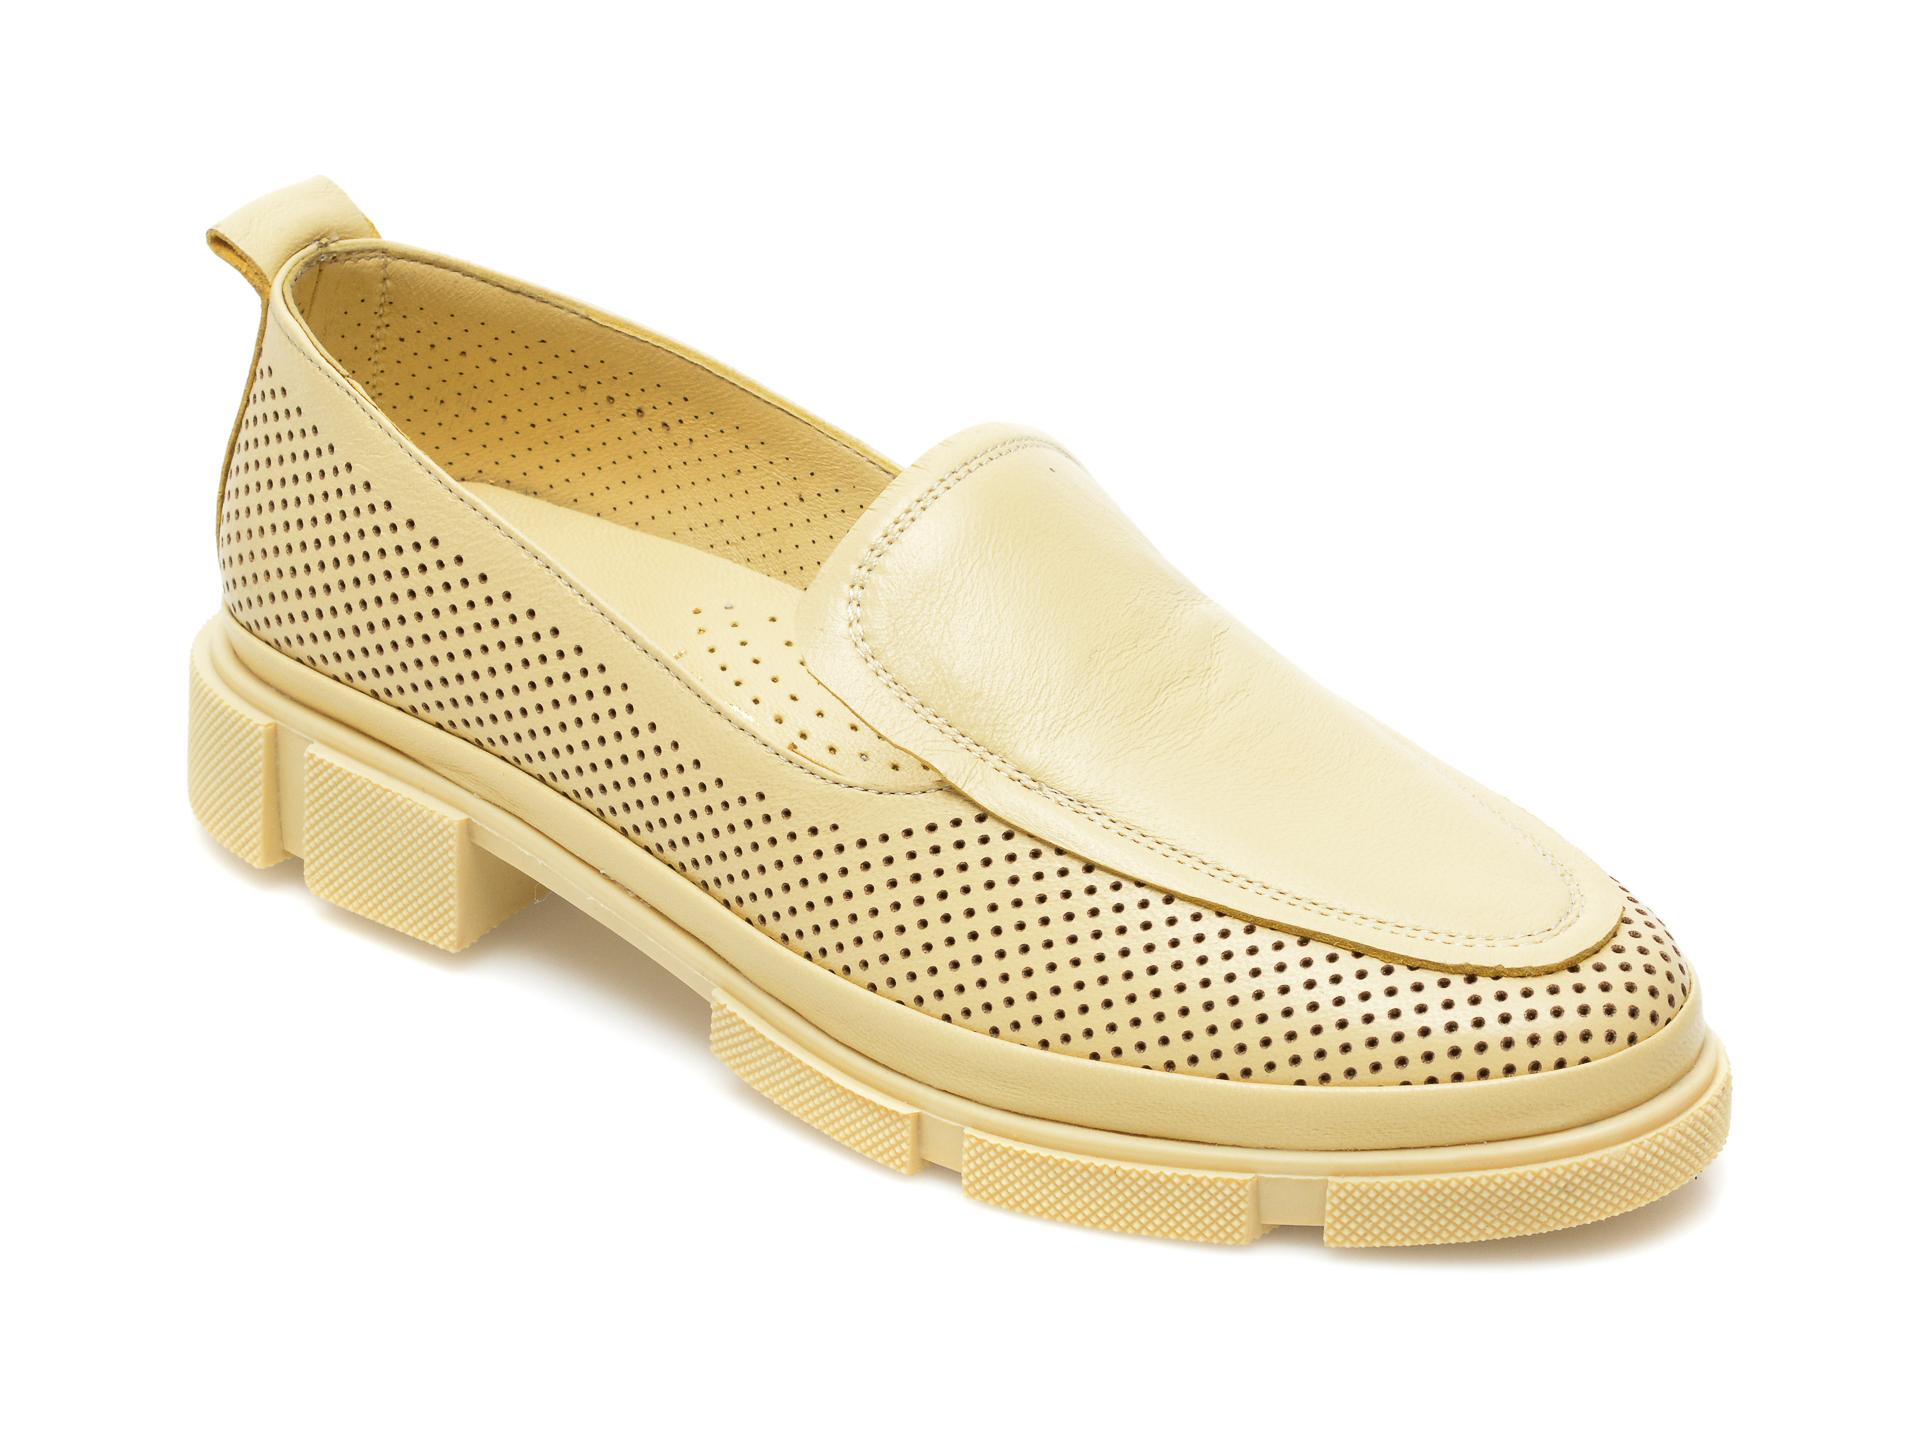 Pantofi MOLLY BESSA galbeni, MN104, din piele naturala